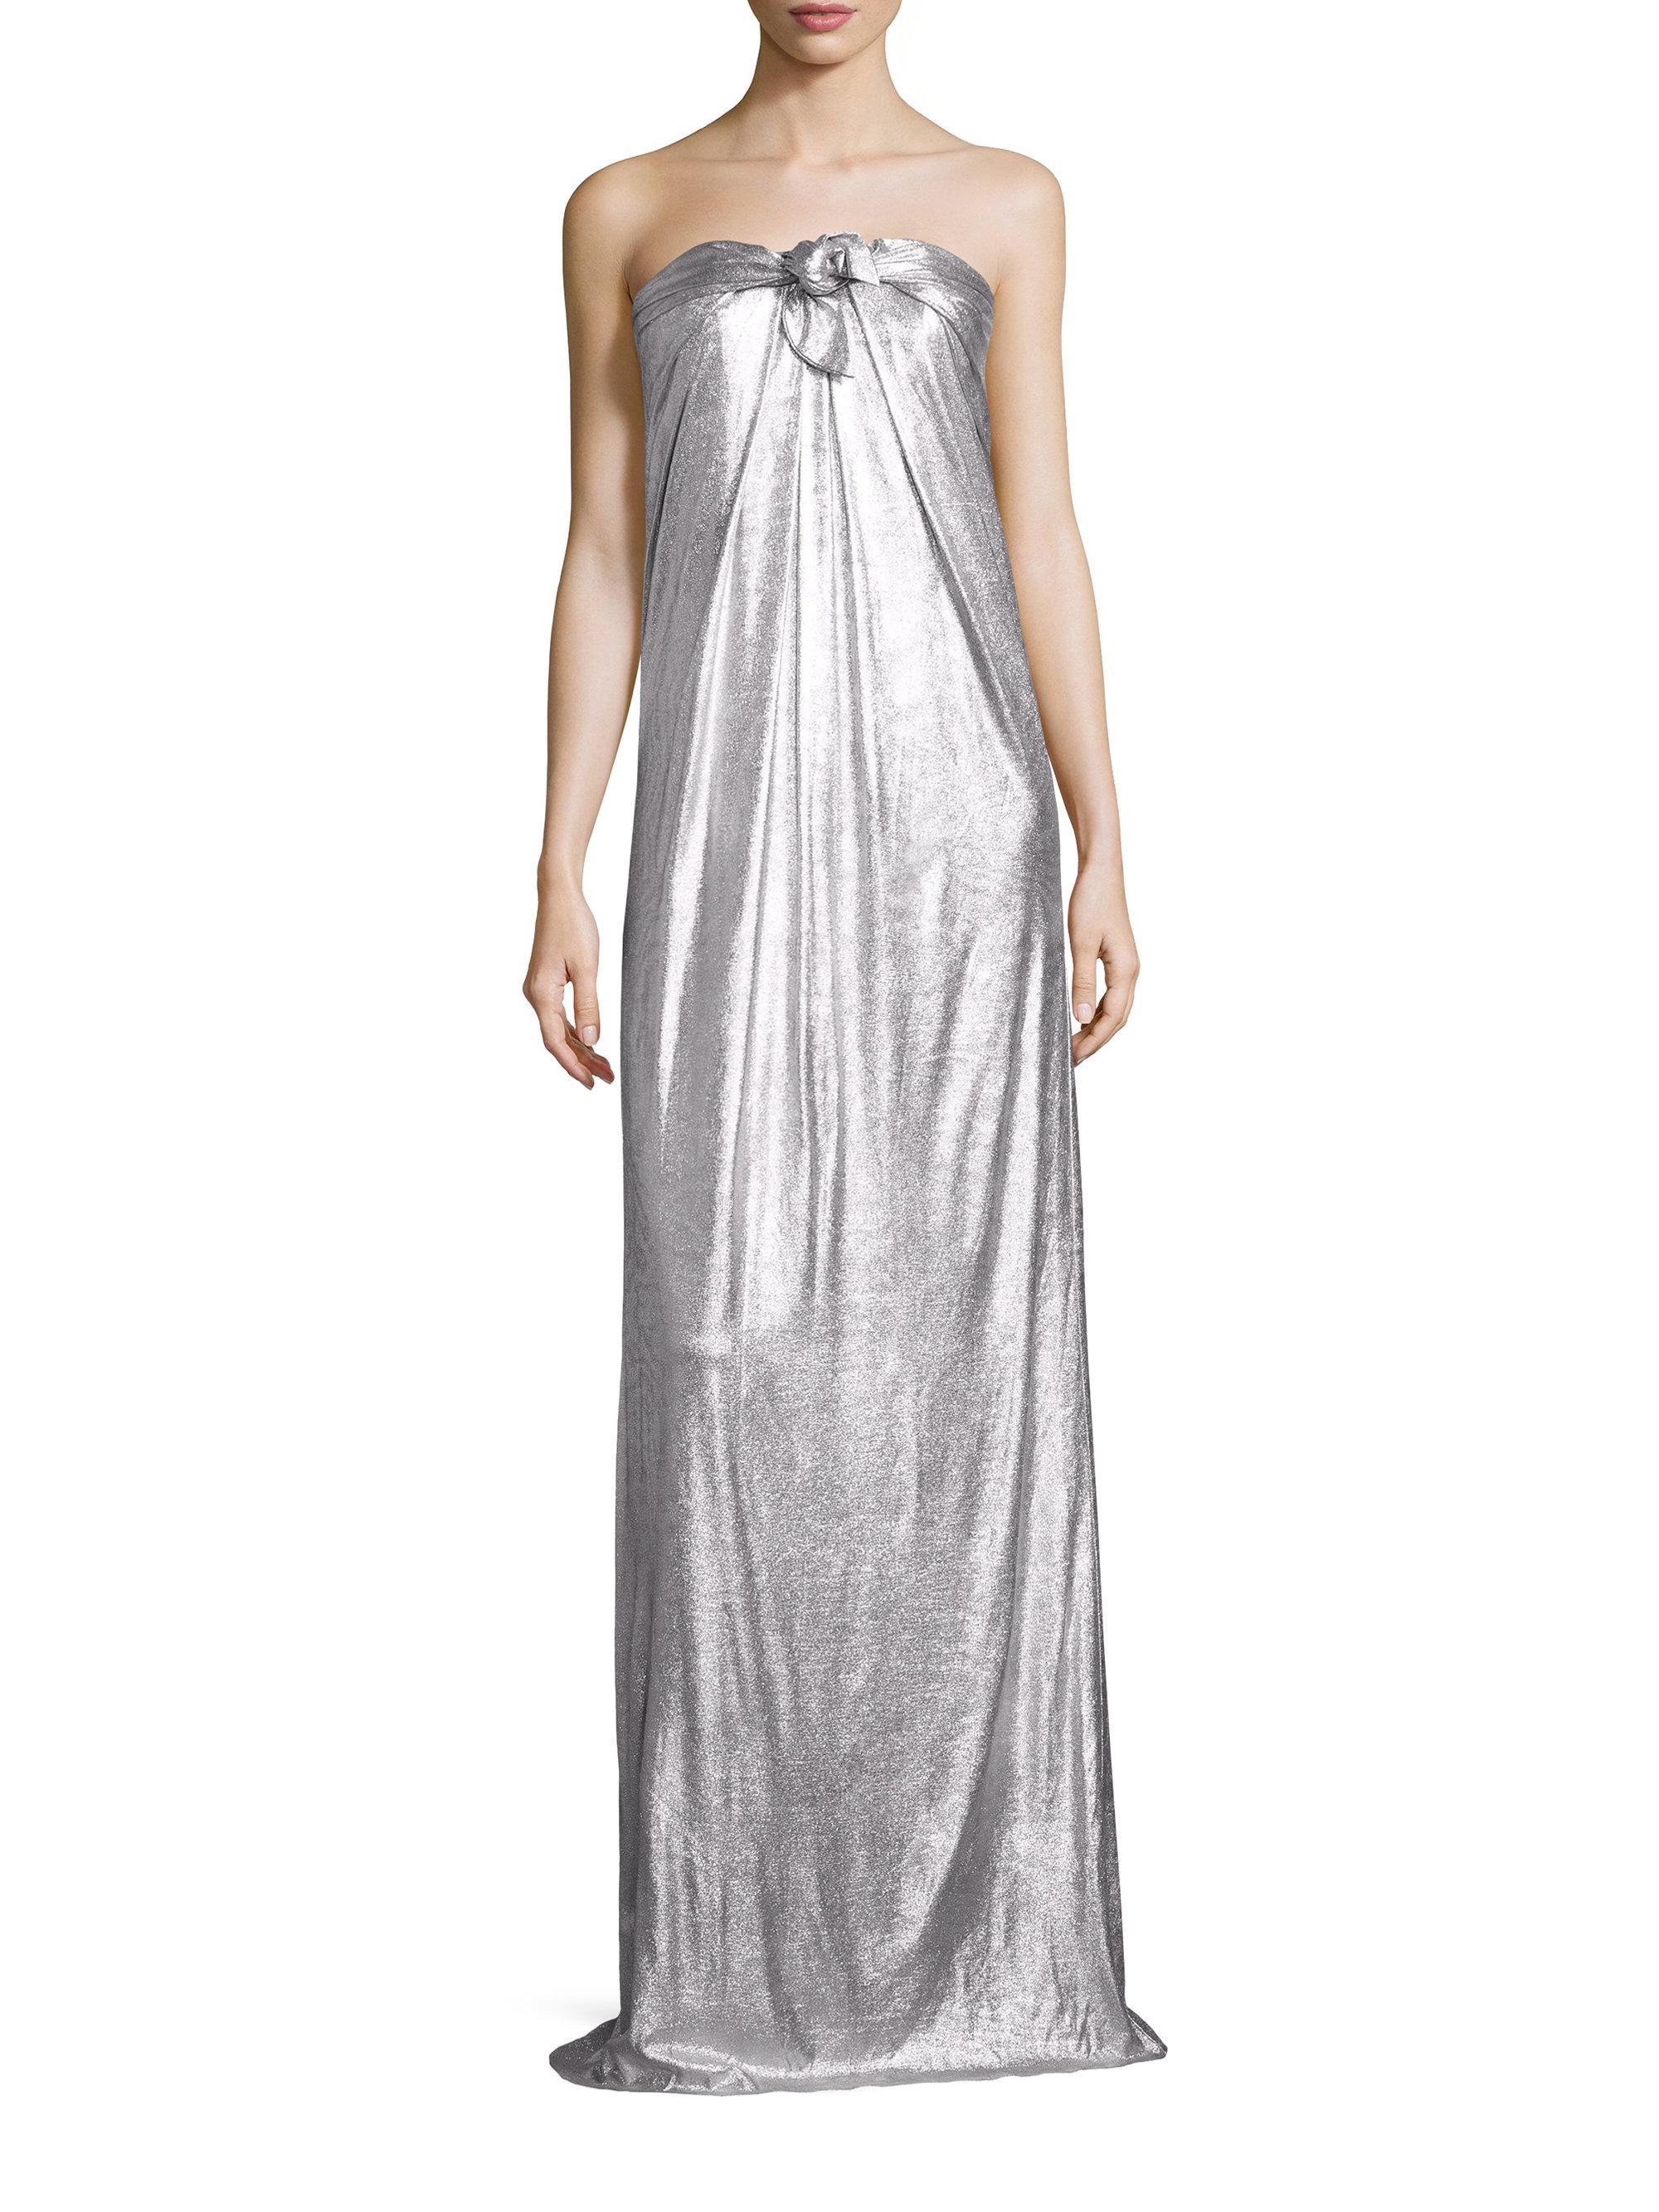 e64be89d91a9 Halston Strapless Metallic Jersey Gown in Metallic - Lyst